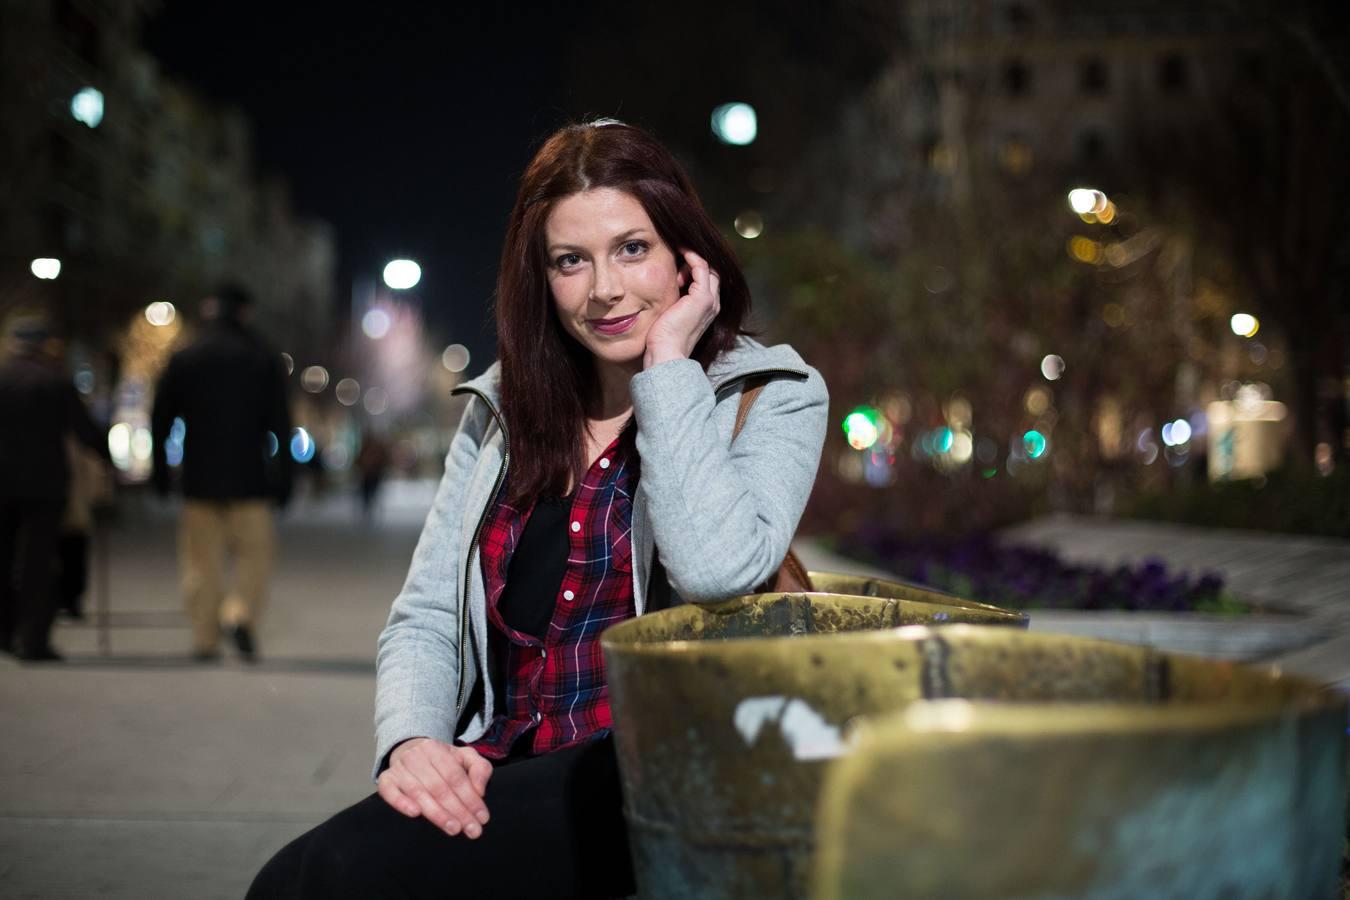 Nieves Chillón, poetisa granadina